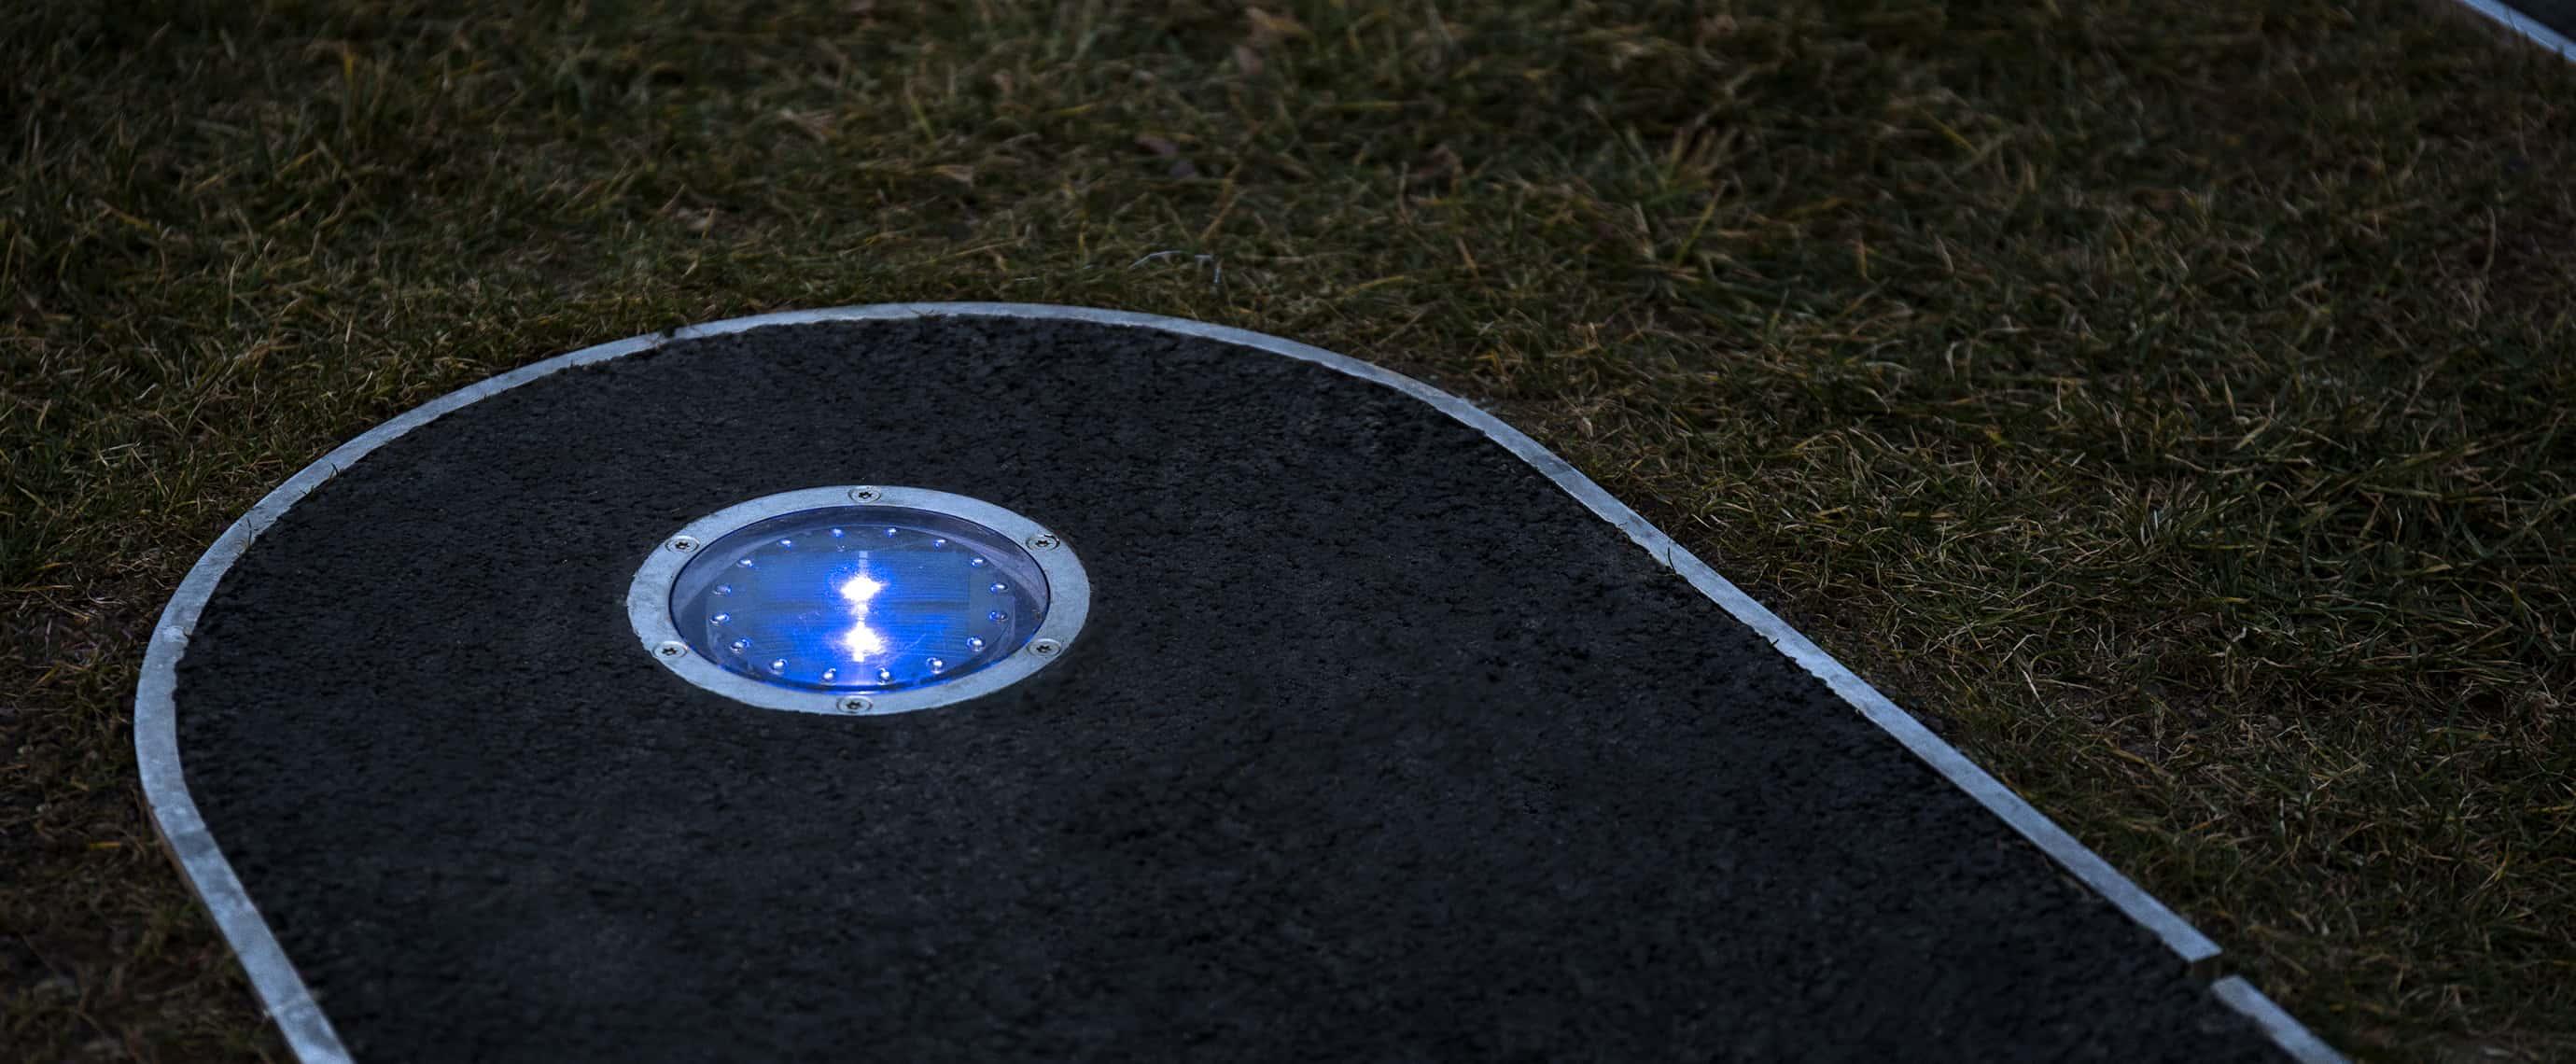 Balisage LED solaire dans un jardin public ECO-120 Eco-Innov